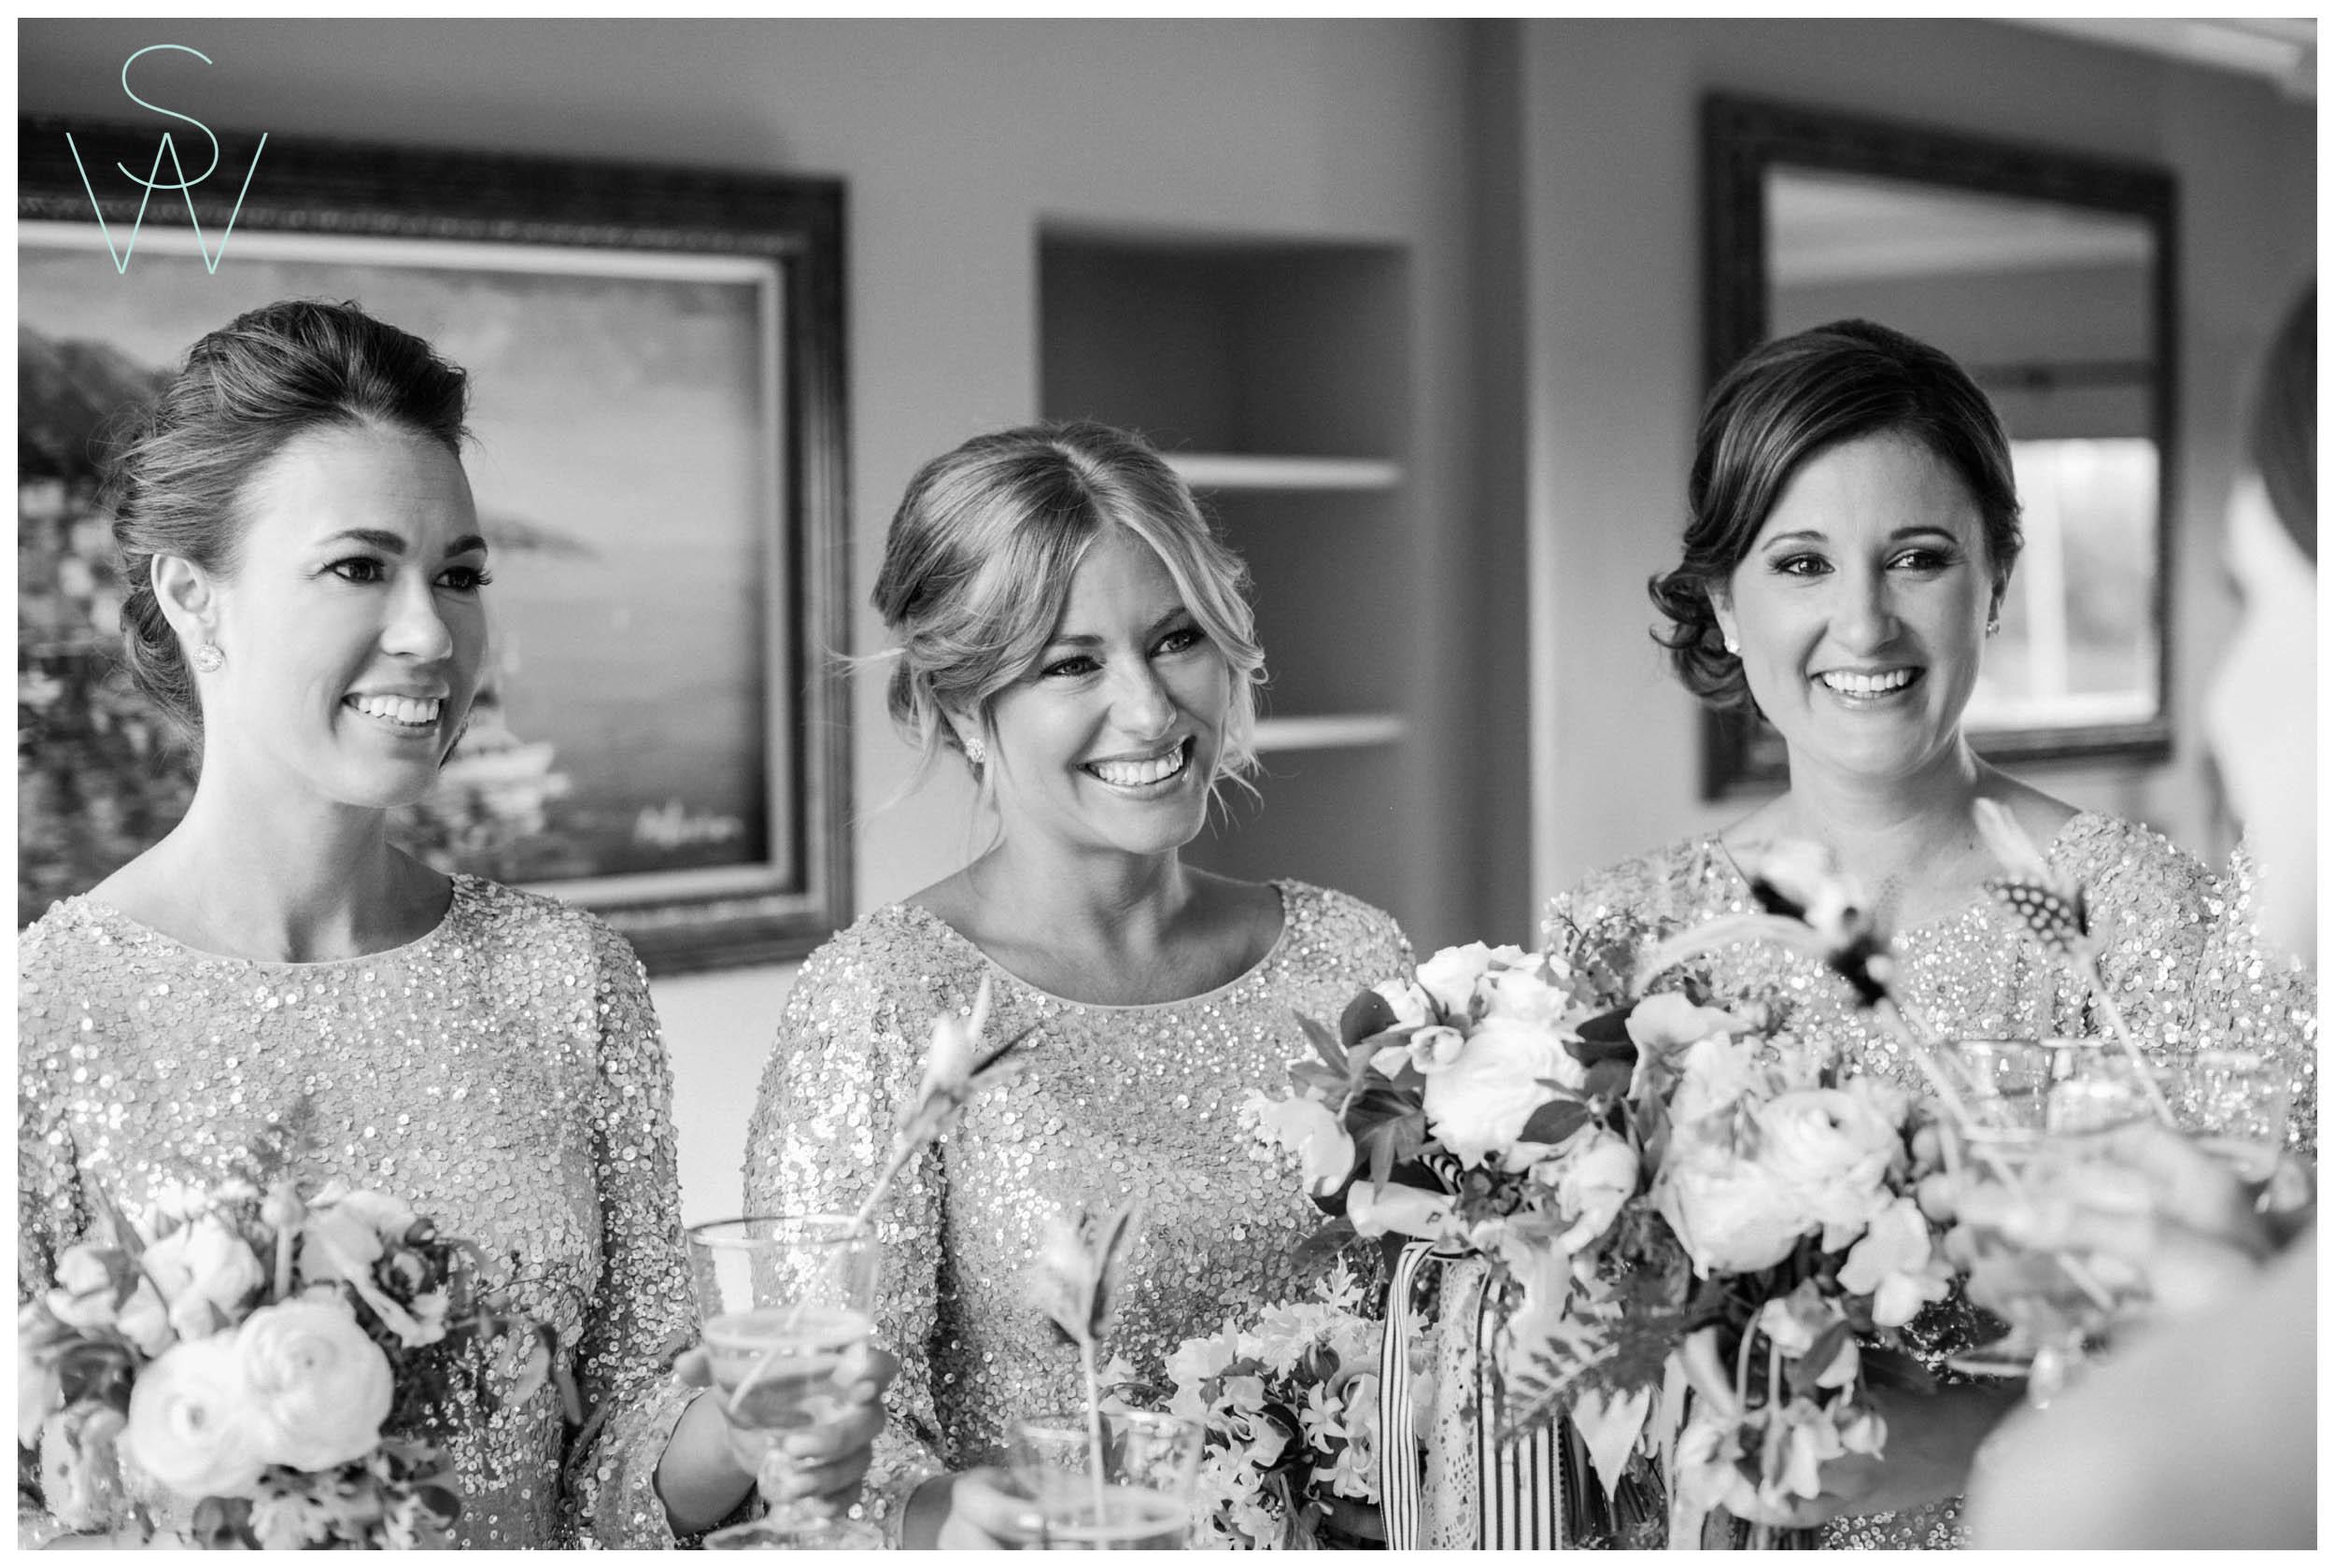 Shewanders.sdma_.wedding.photography-1009.jpg.wedding.photography-1009.jpg